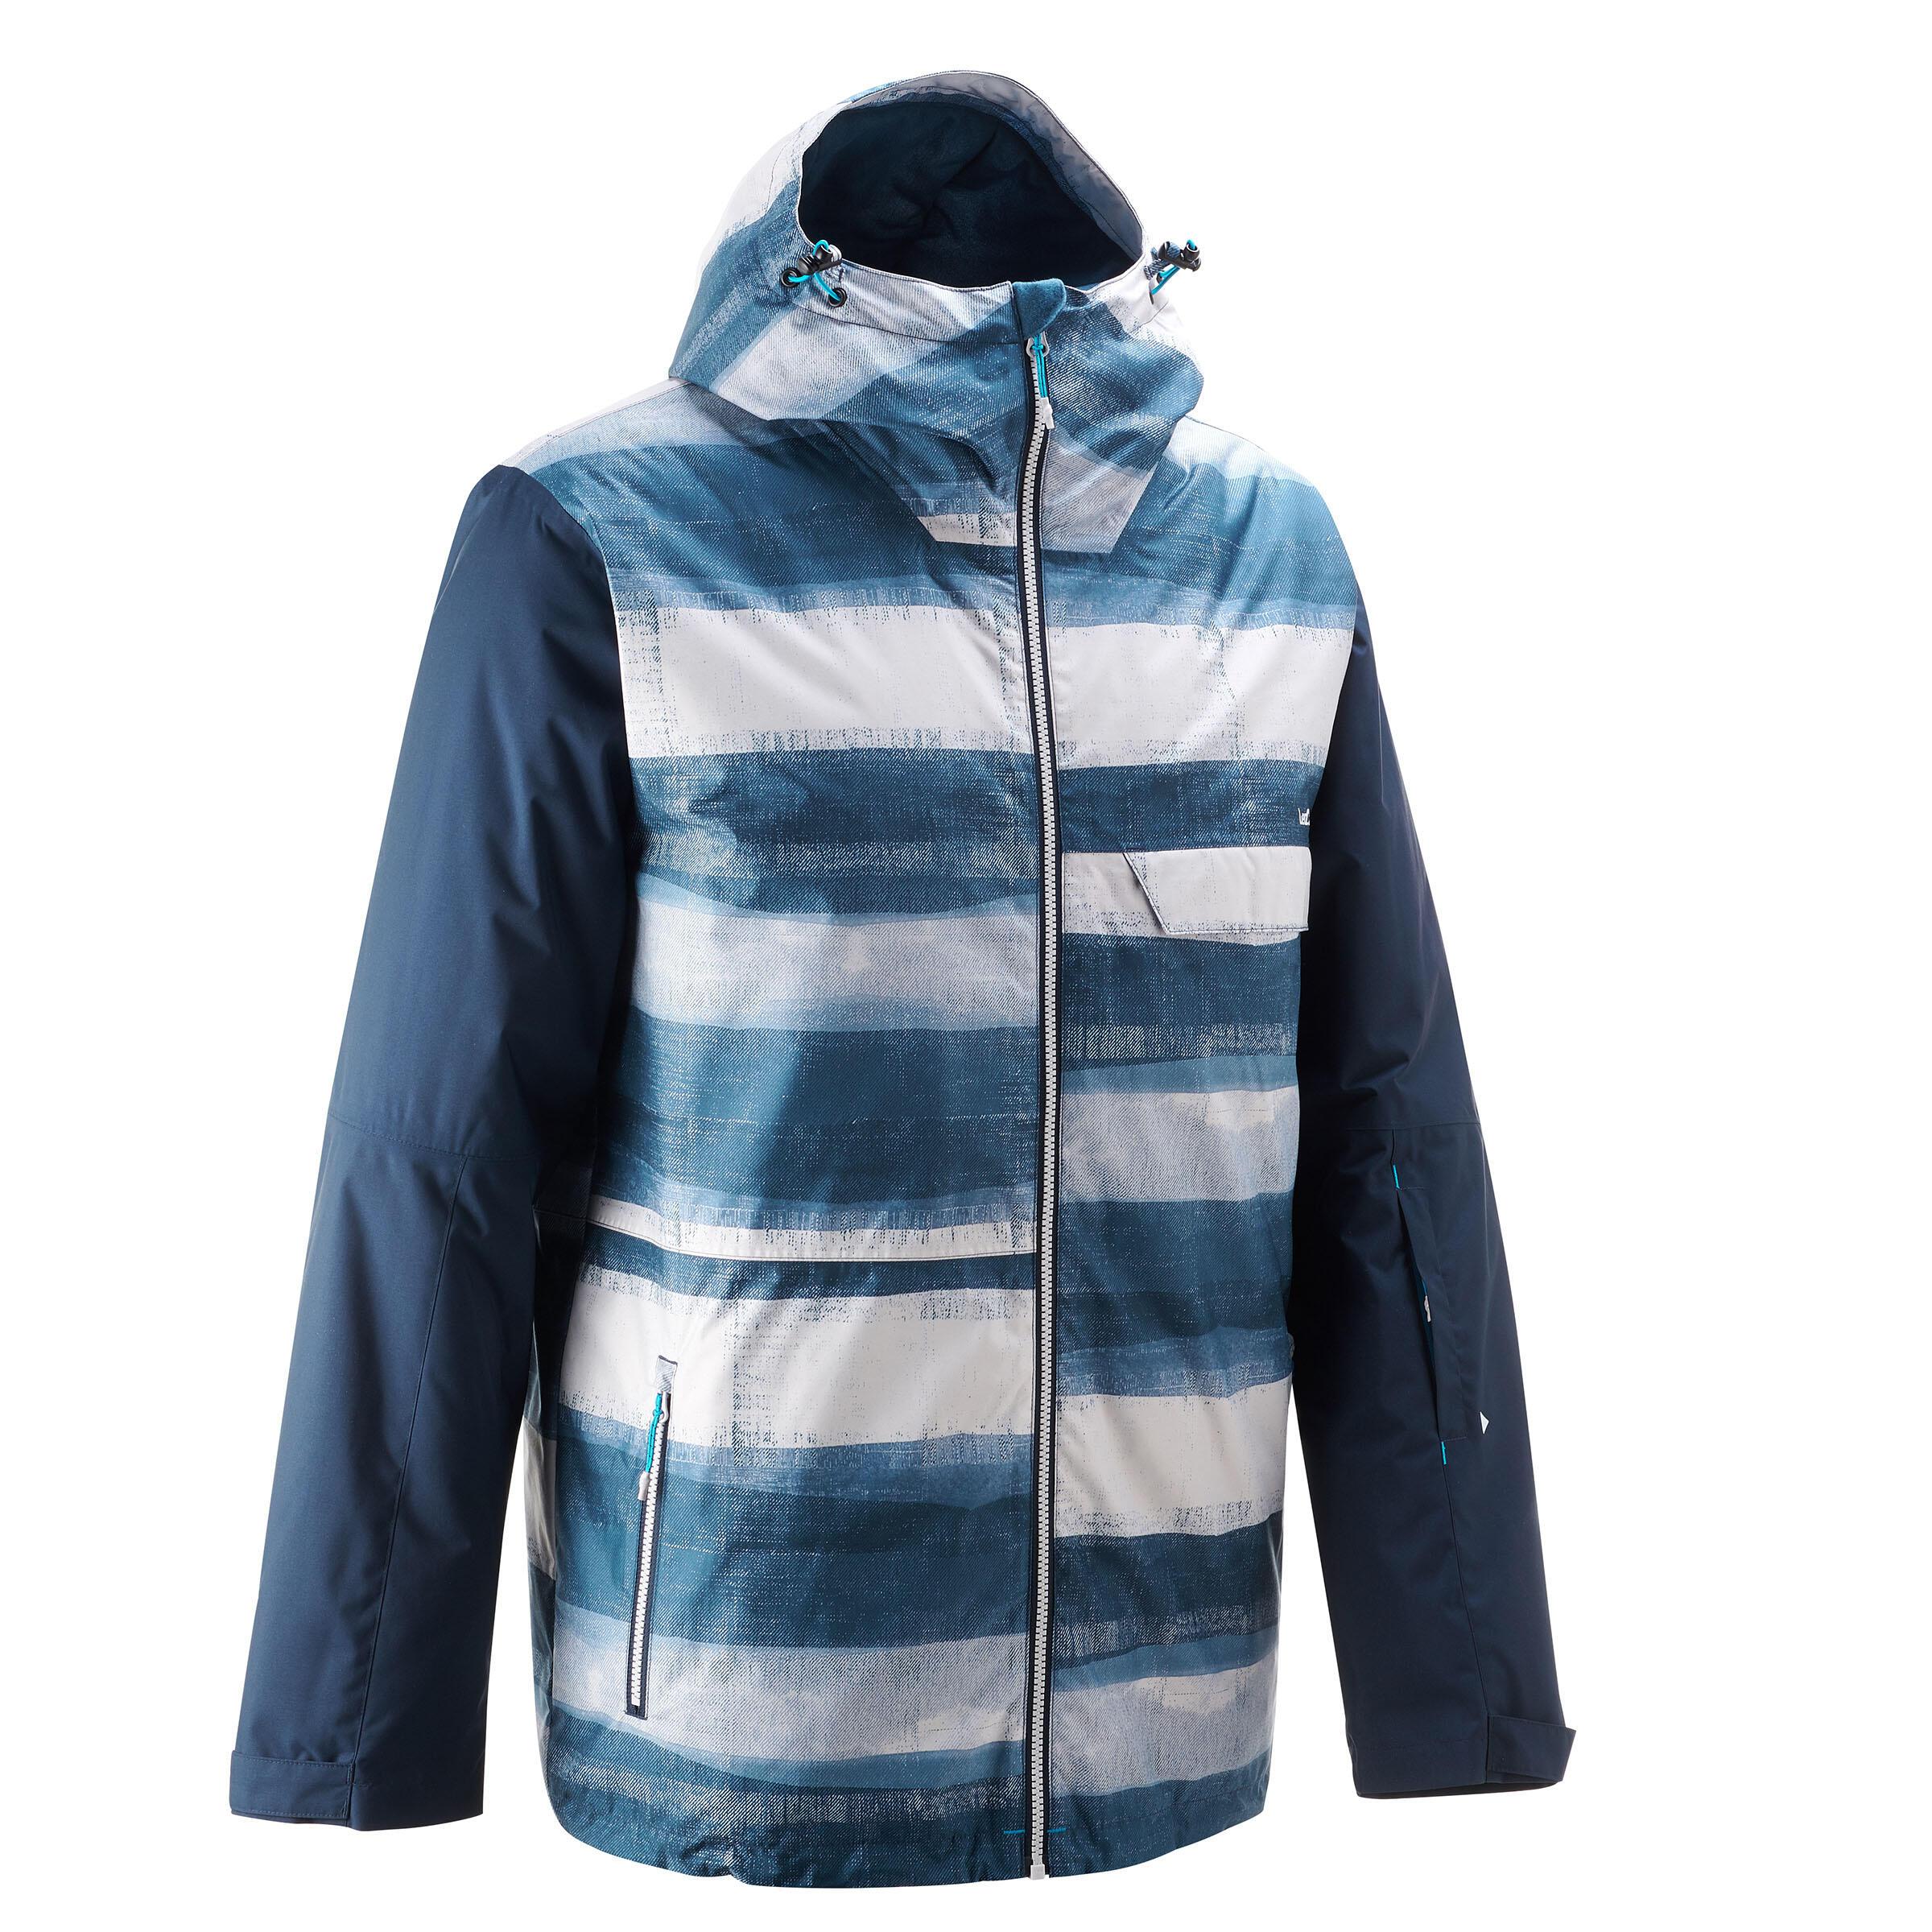 Snowboardjacke SNB JKT 100 Herren Print blau | Sportbekleidung > Sportjacken > Snowboardjacken | Blau | Wed'ze